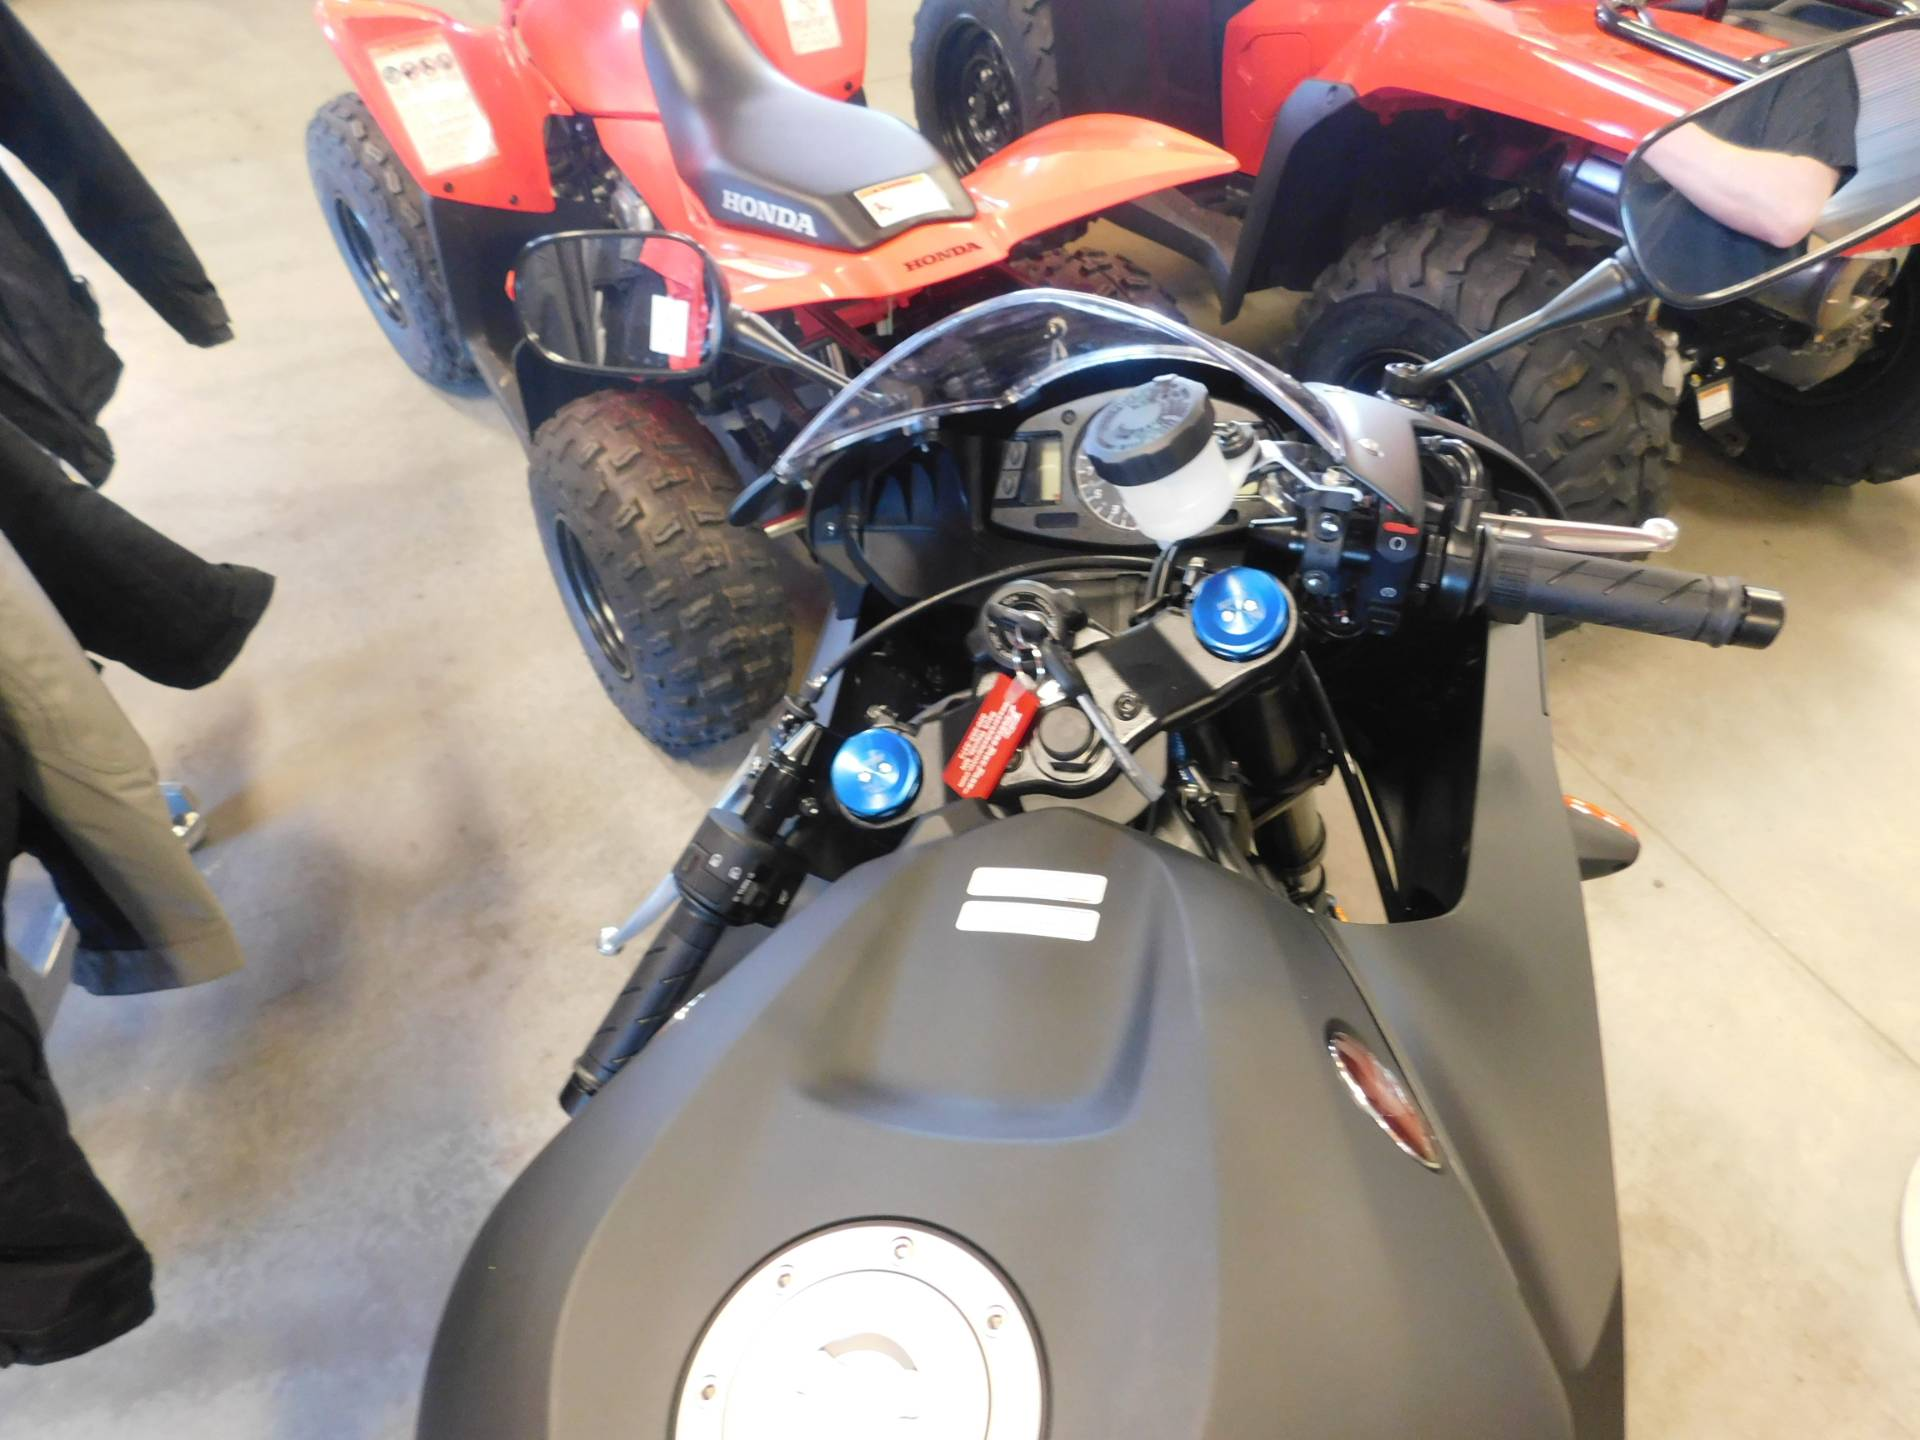 New 2019 Honda Cbr600rr Motorcycles In Sauk Rapids Mn Stock